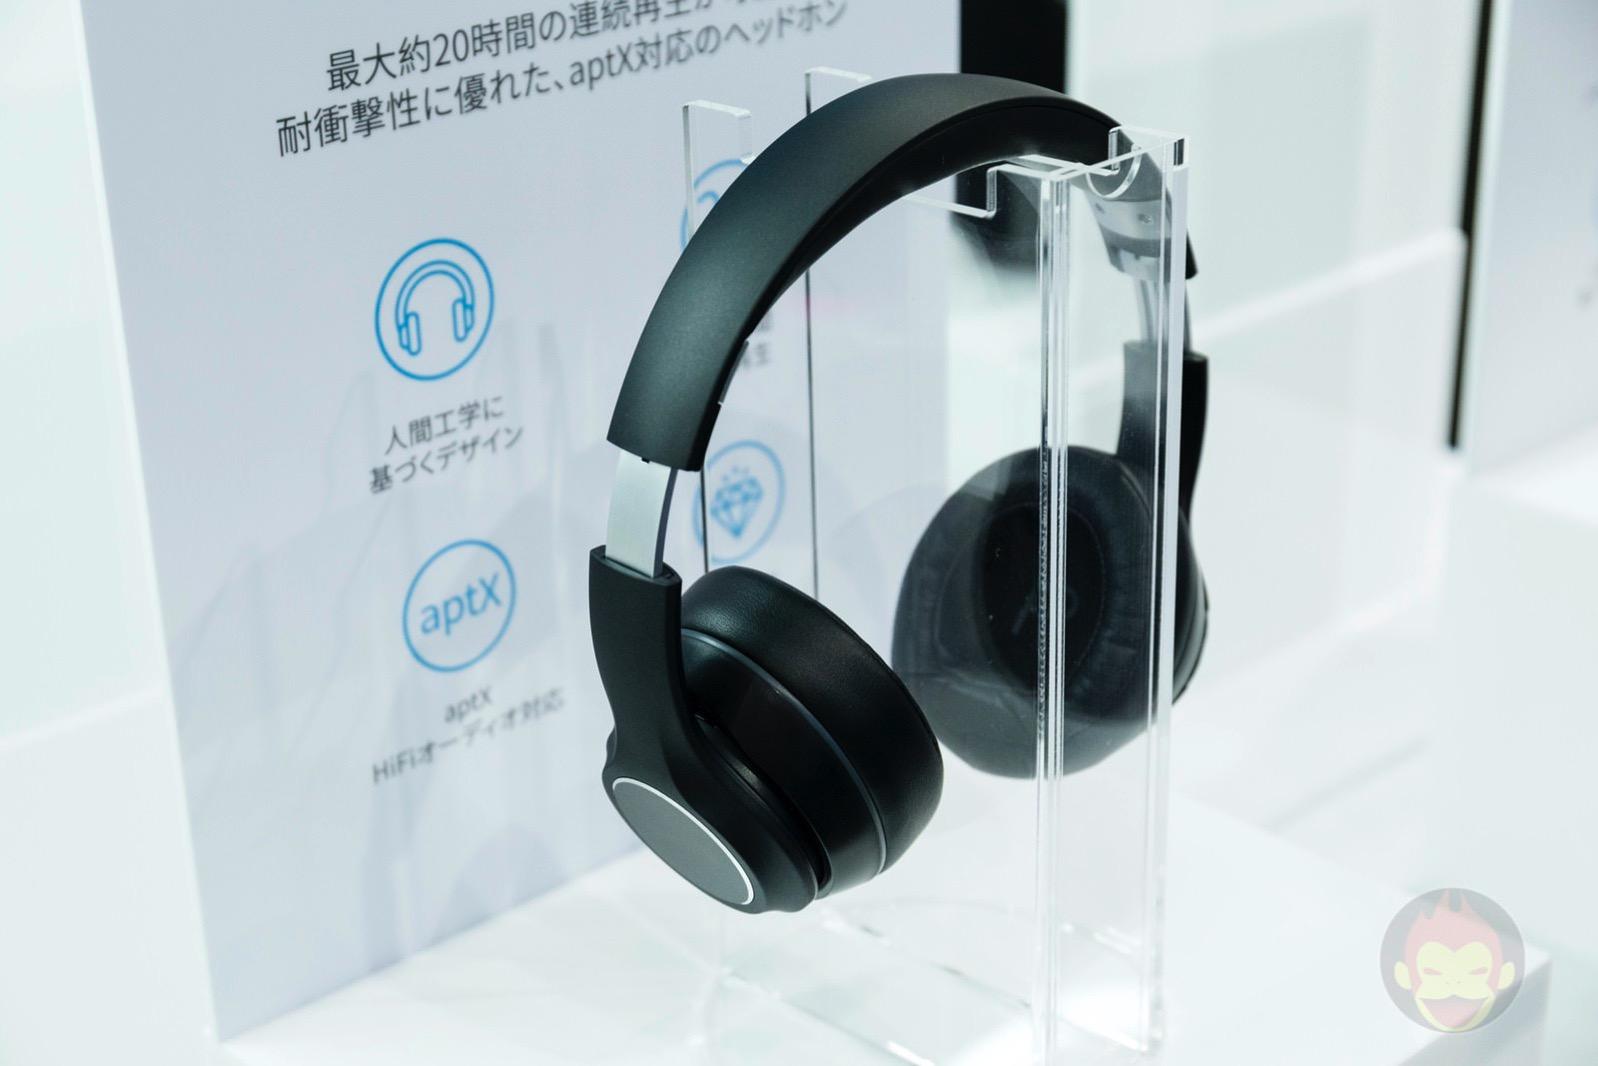 Anker-SoundCore-Vortex-04.jpg